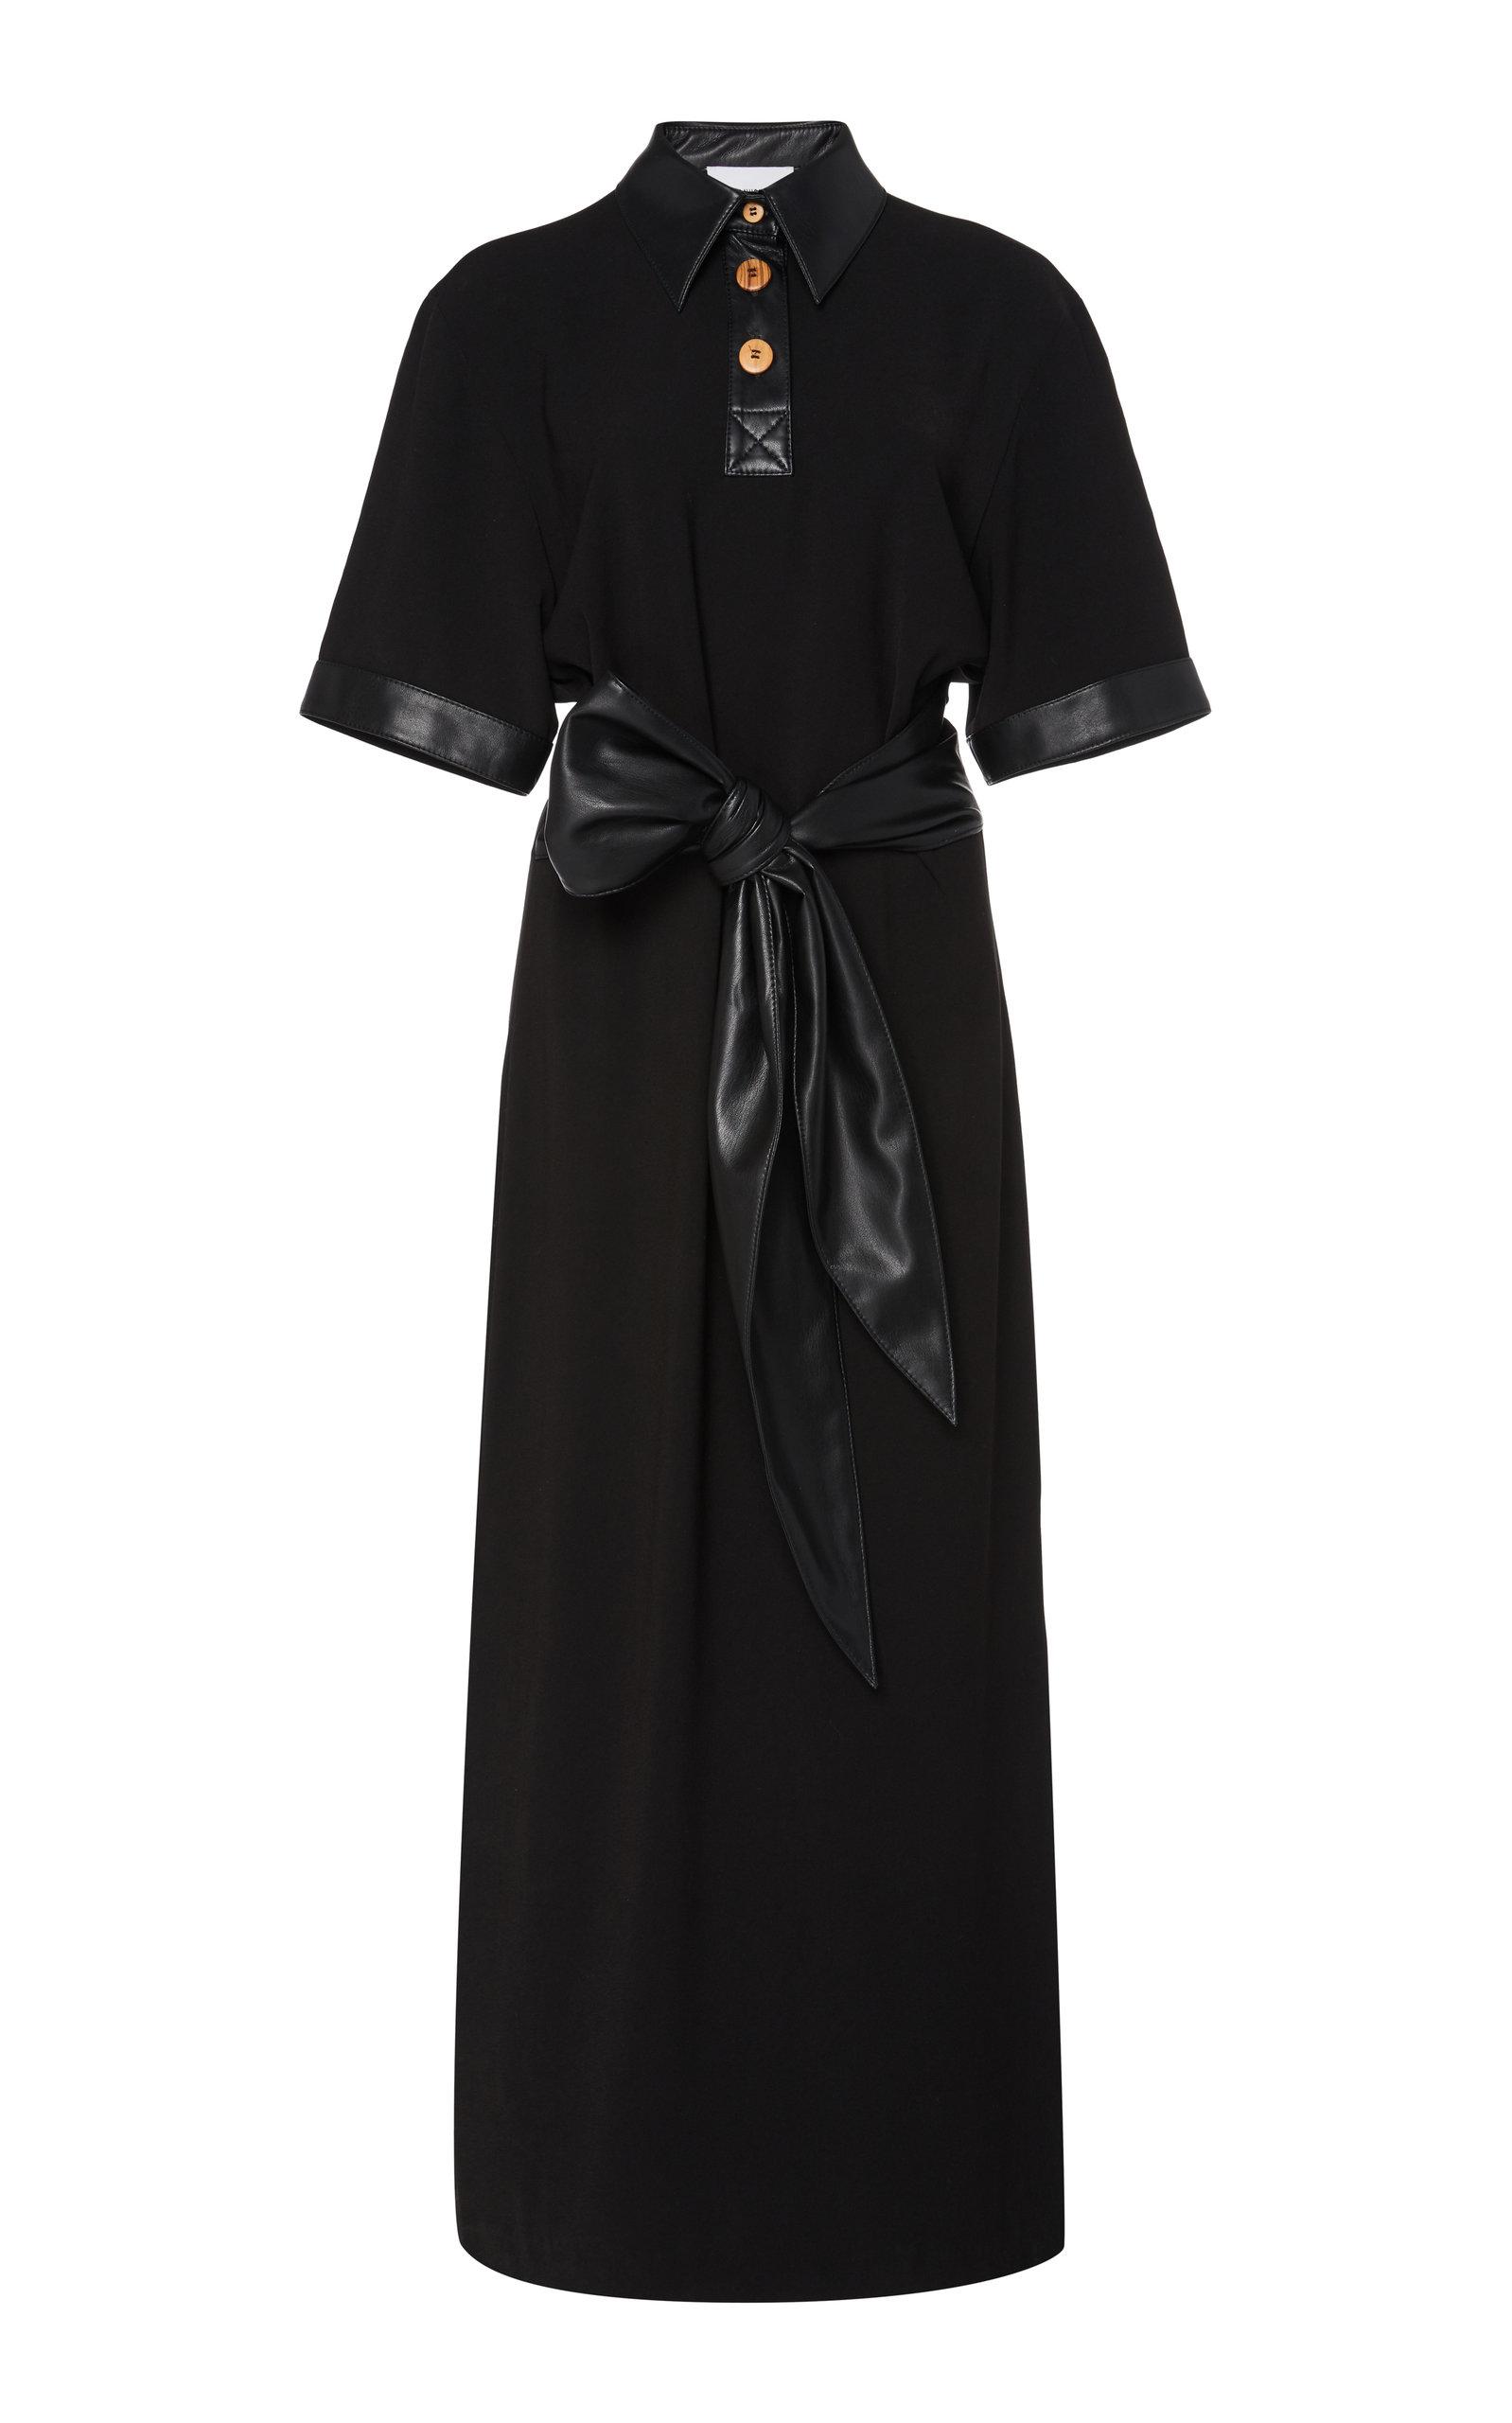 Buy Nanushka Leila Tie-Front Vegan Leather-Trimmed Crepe Dress online, shop Nanushka at the best price